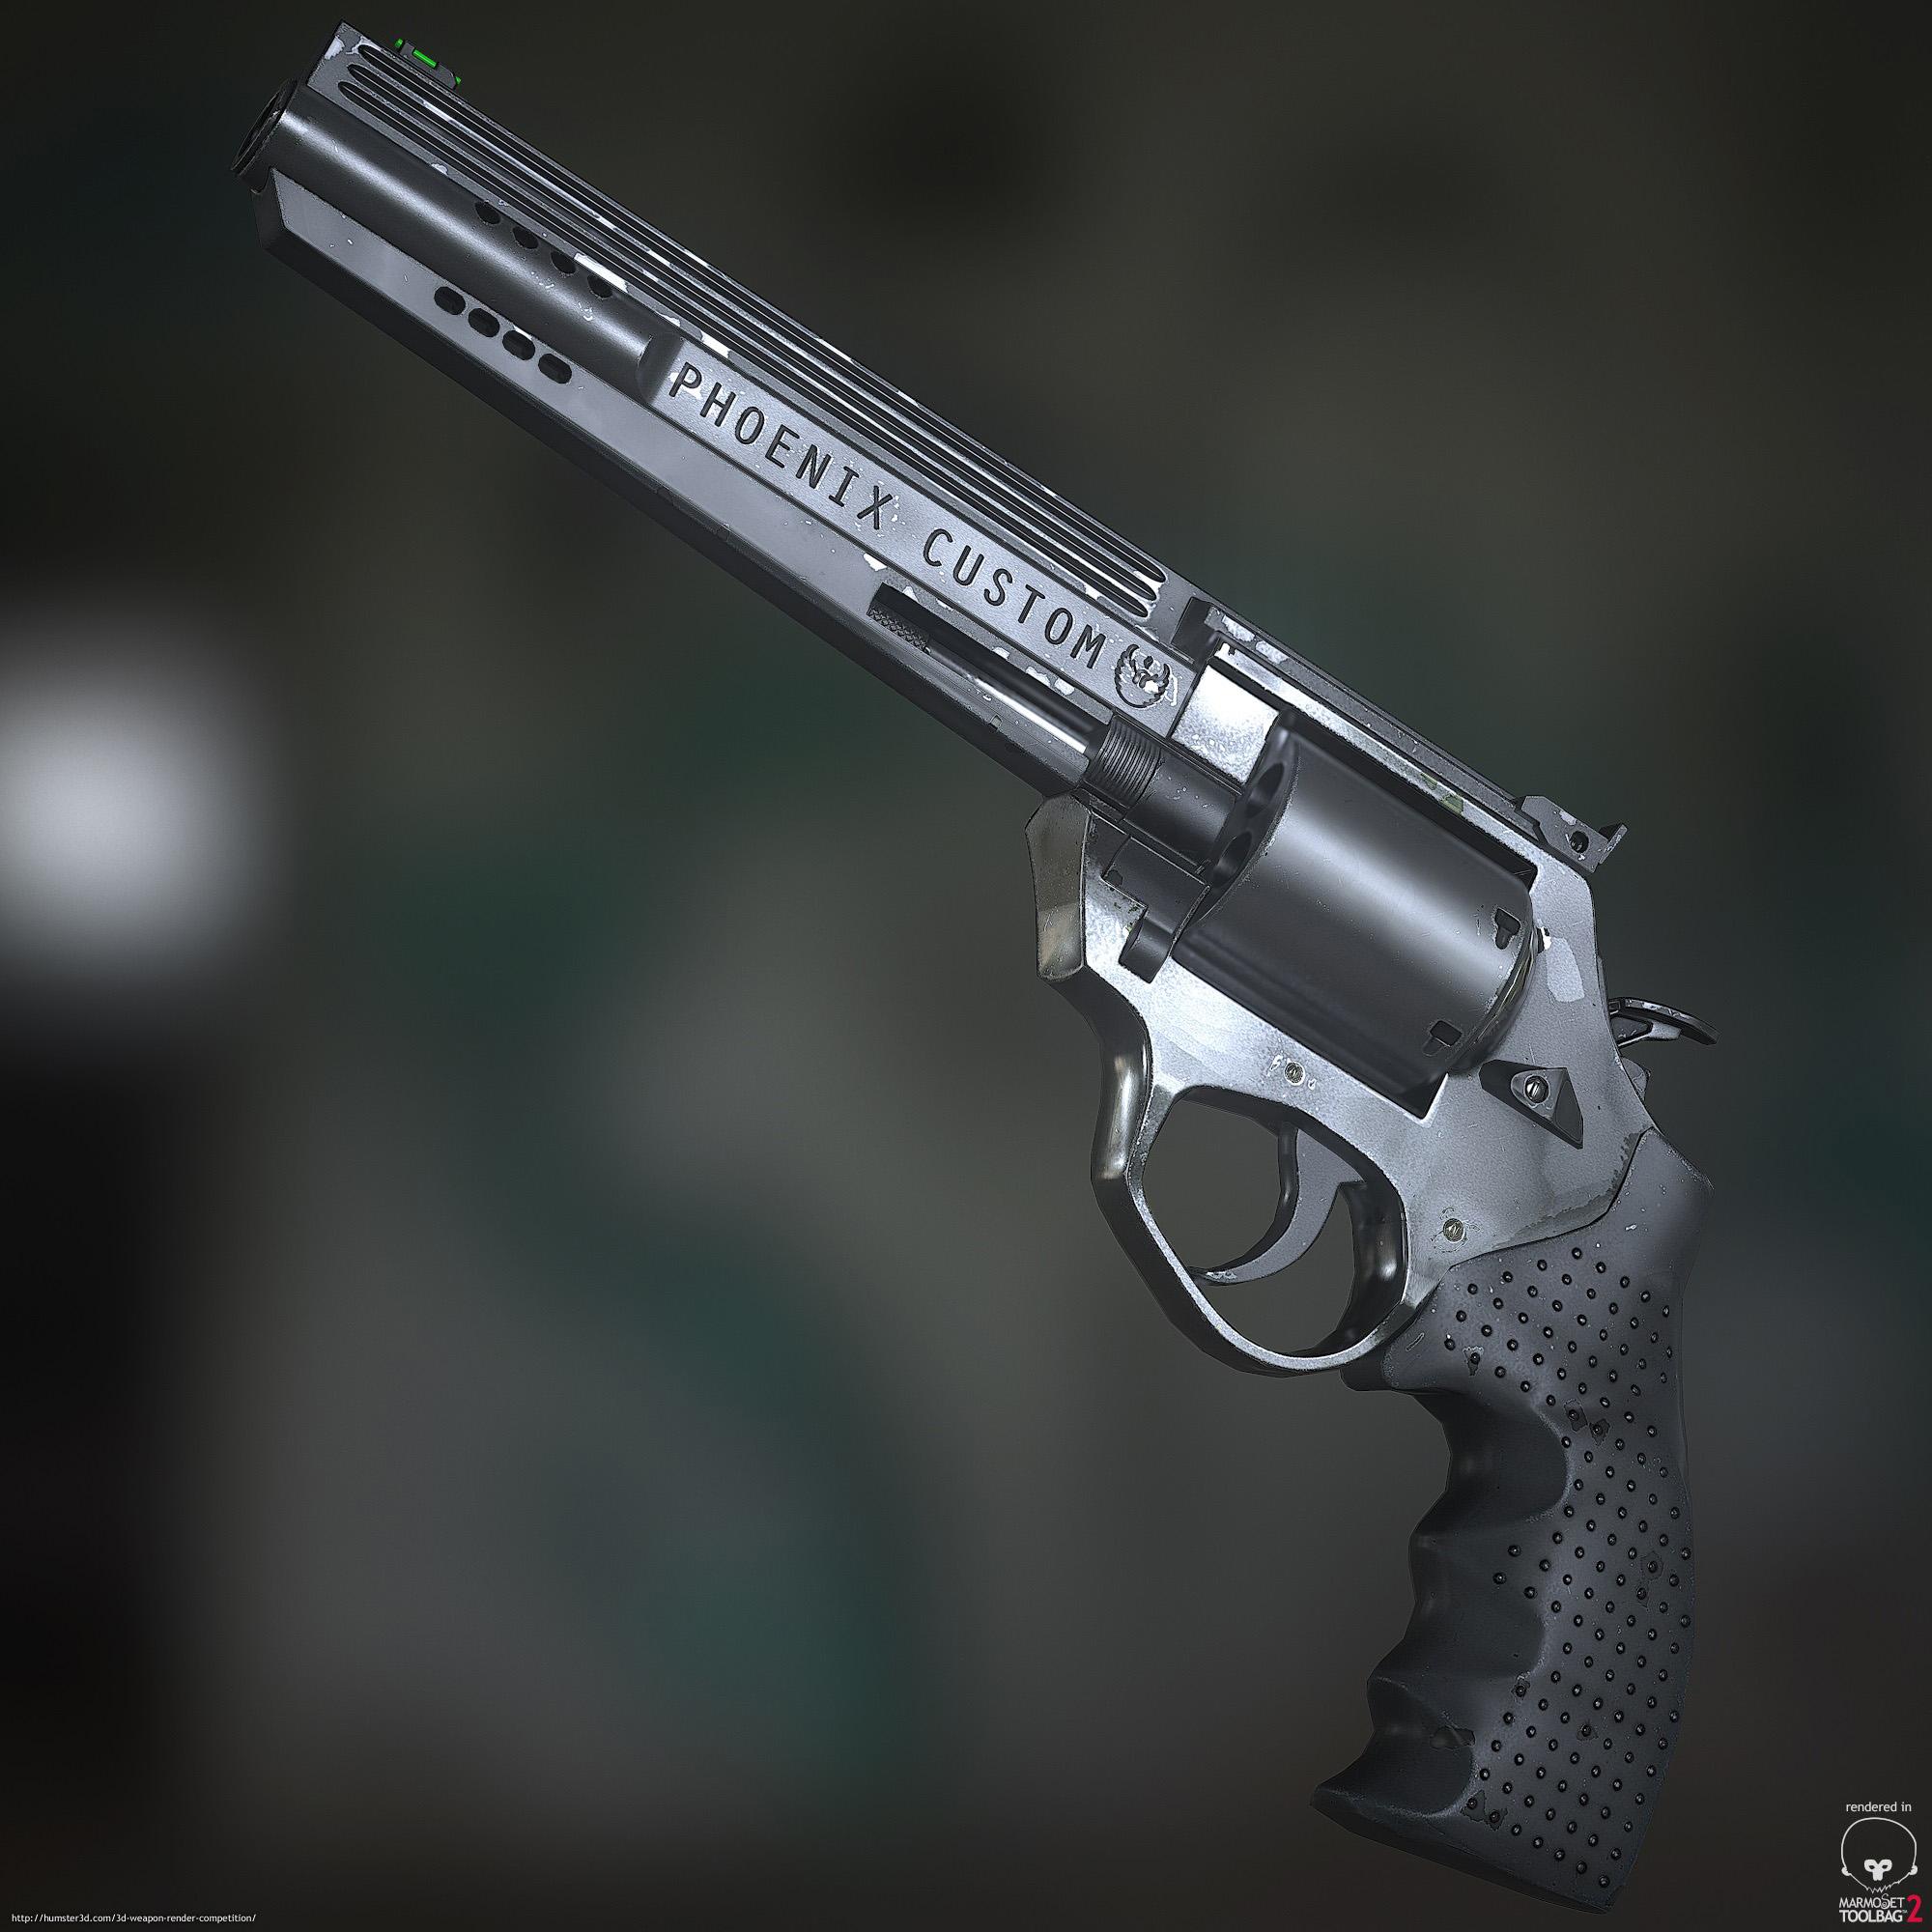 Phoenix Custom Revolver